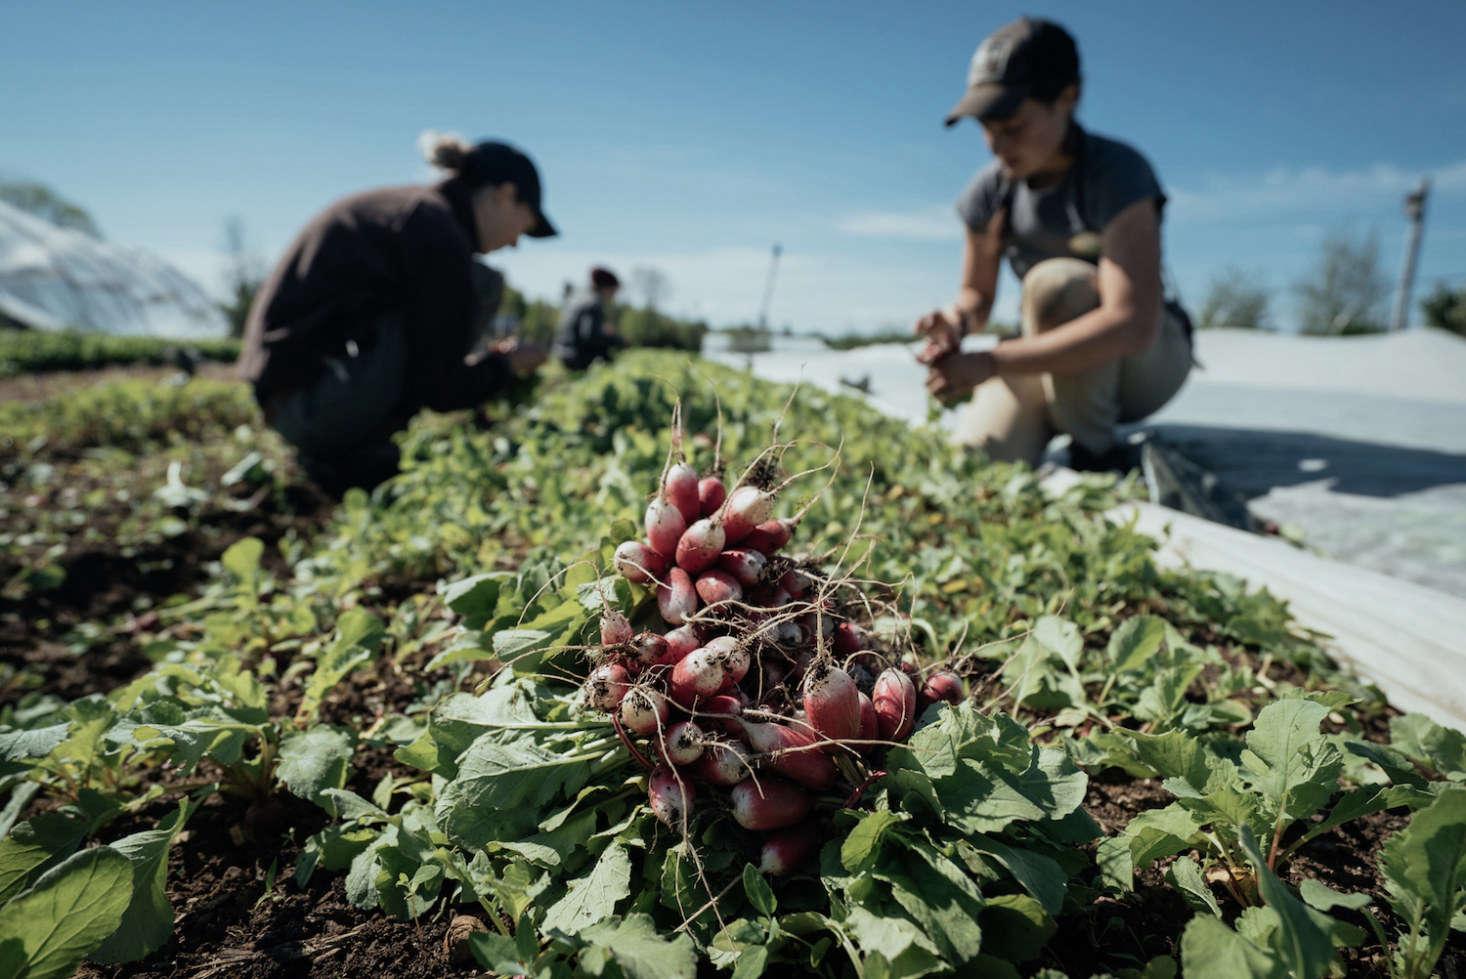 Interns harvest radishes.